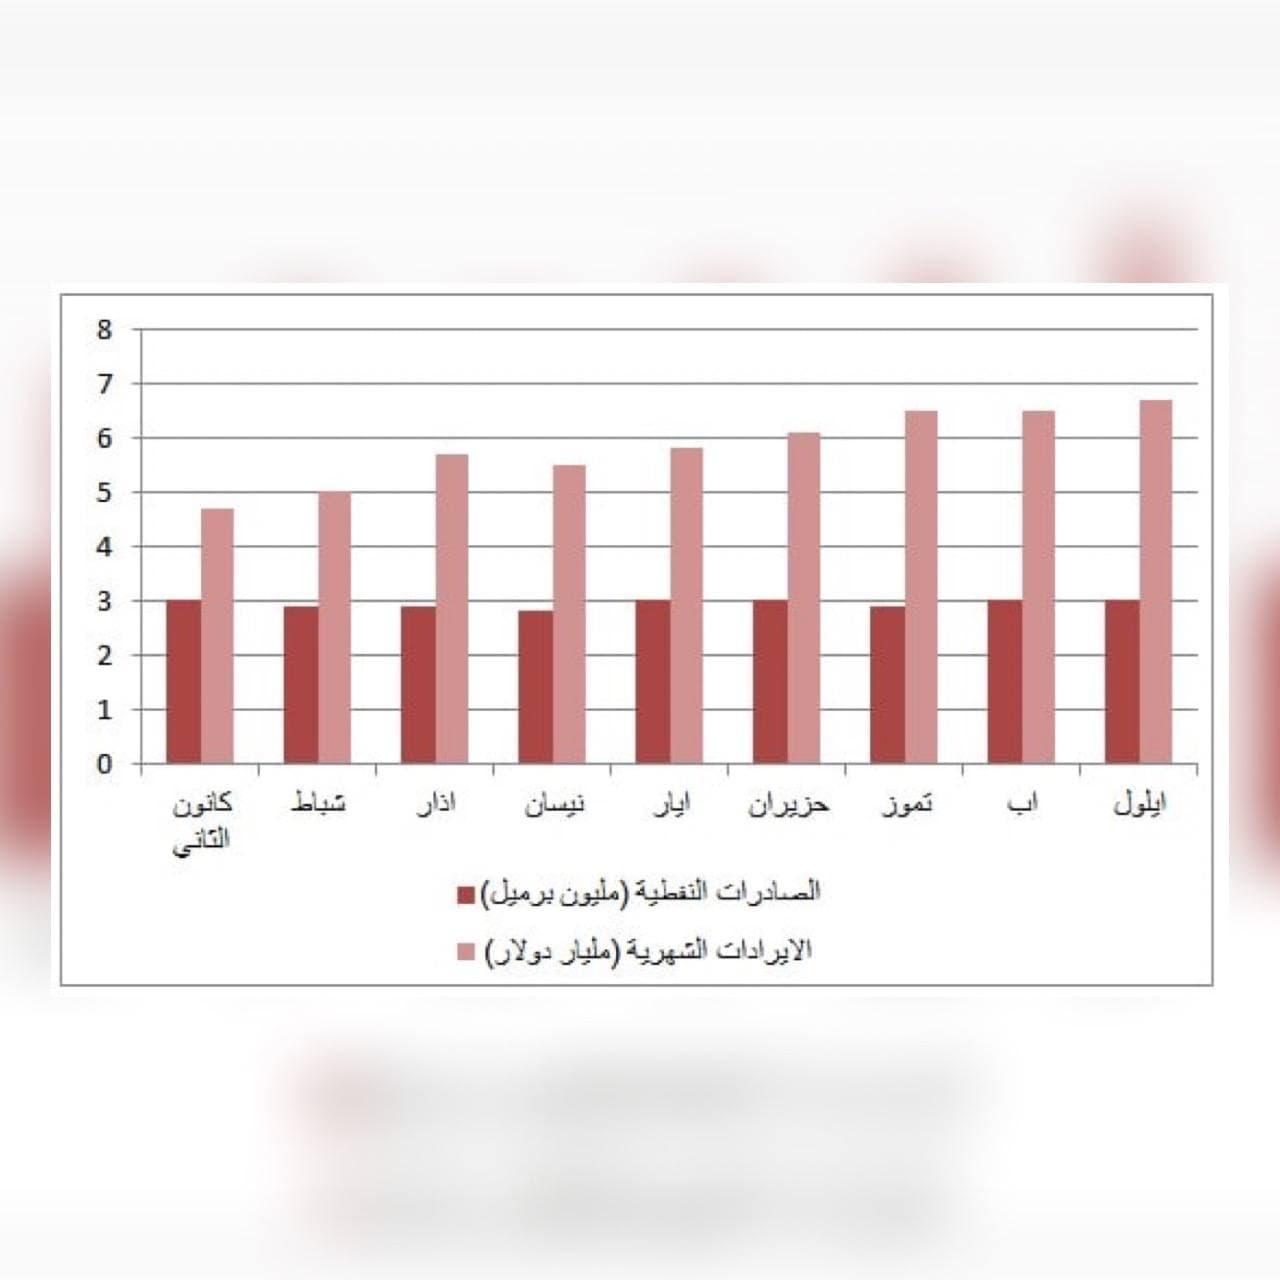 Read more about the article تحسن اسعار النفط وحقيقة الوفرة المالية في موازنة 2021